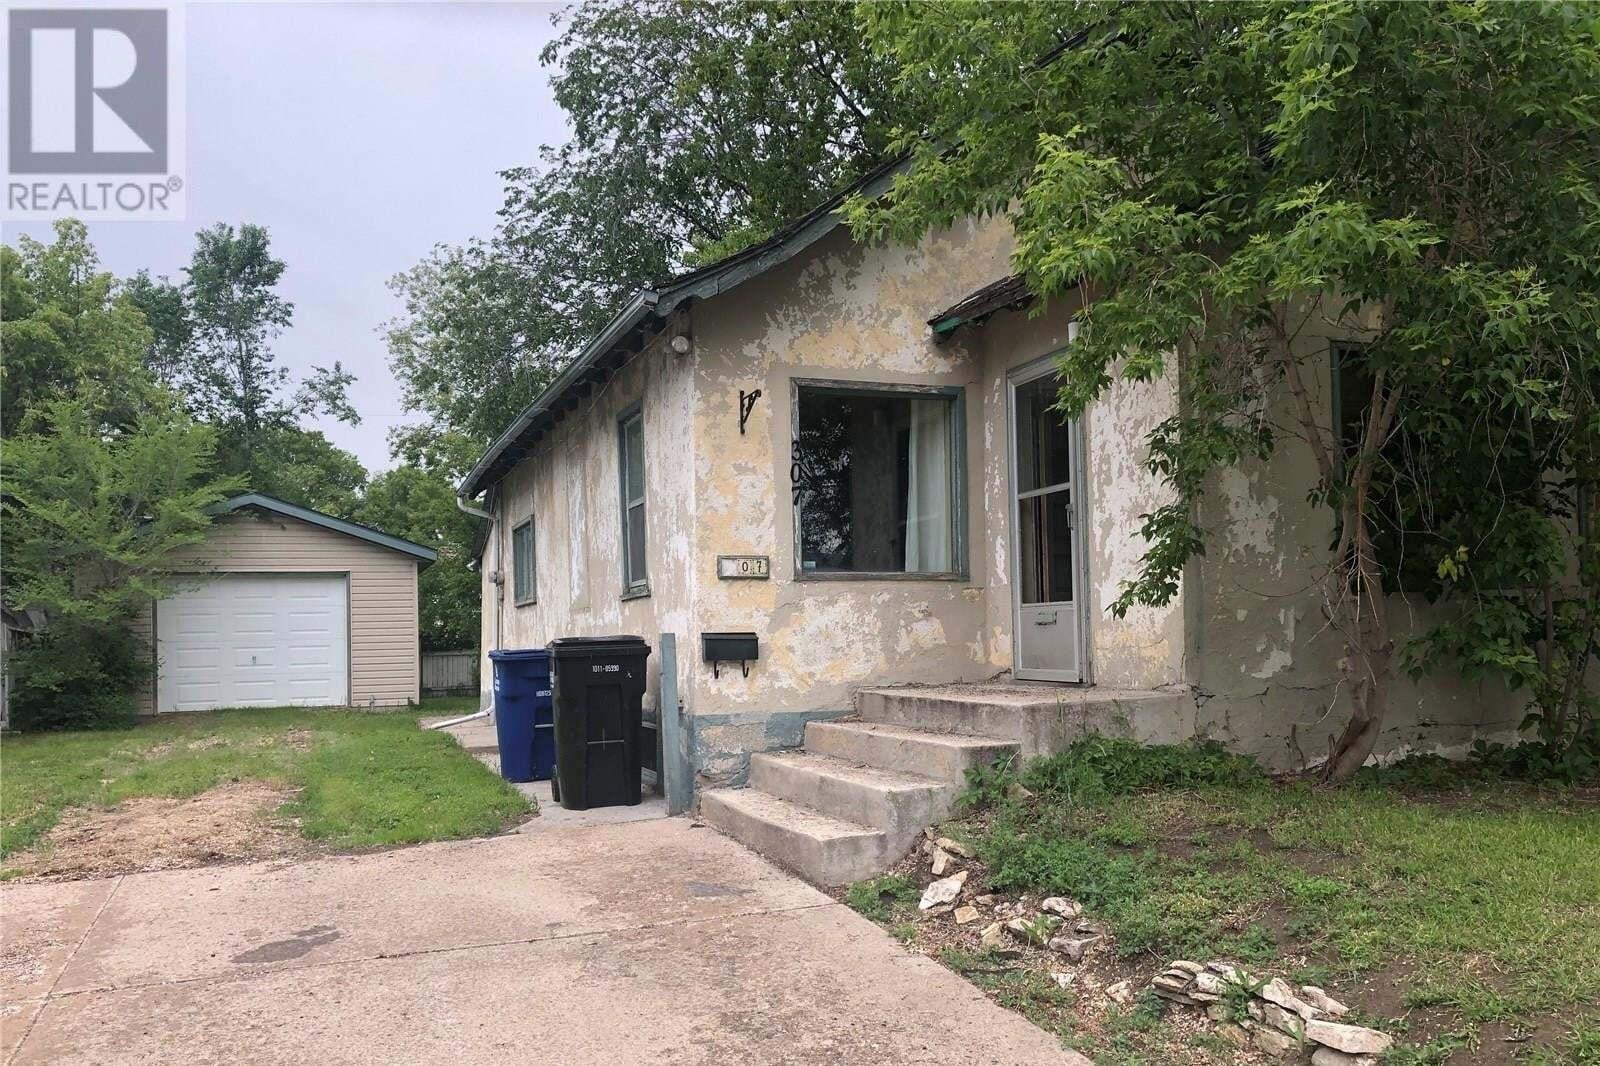 House for sale at 307 Y Ave S Saskatoon Saskatchewan - MLS: SK814317